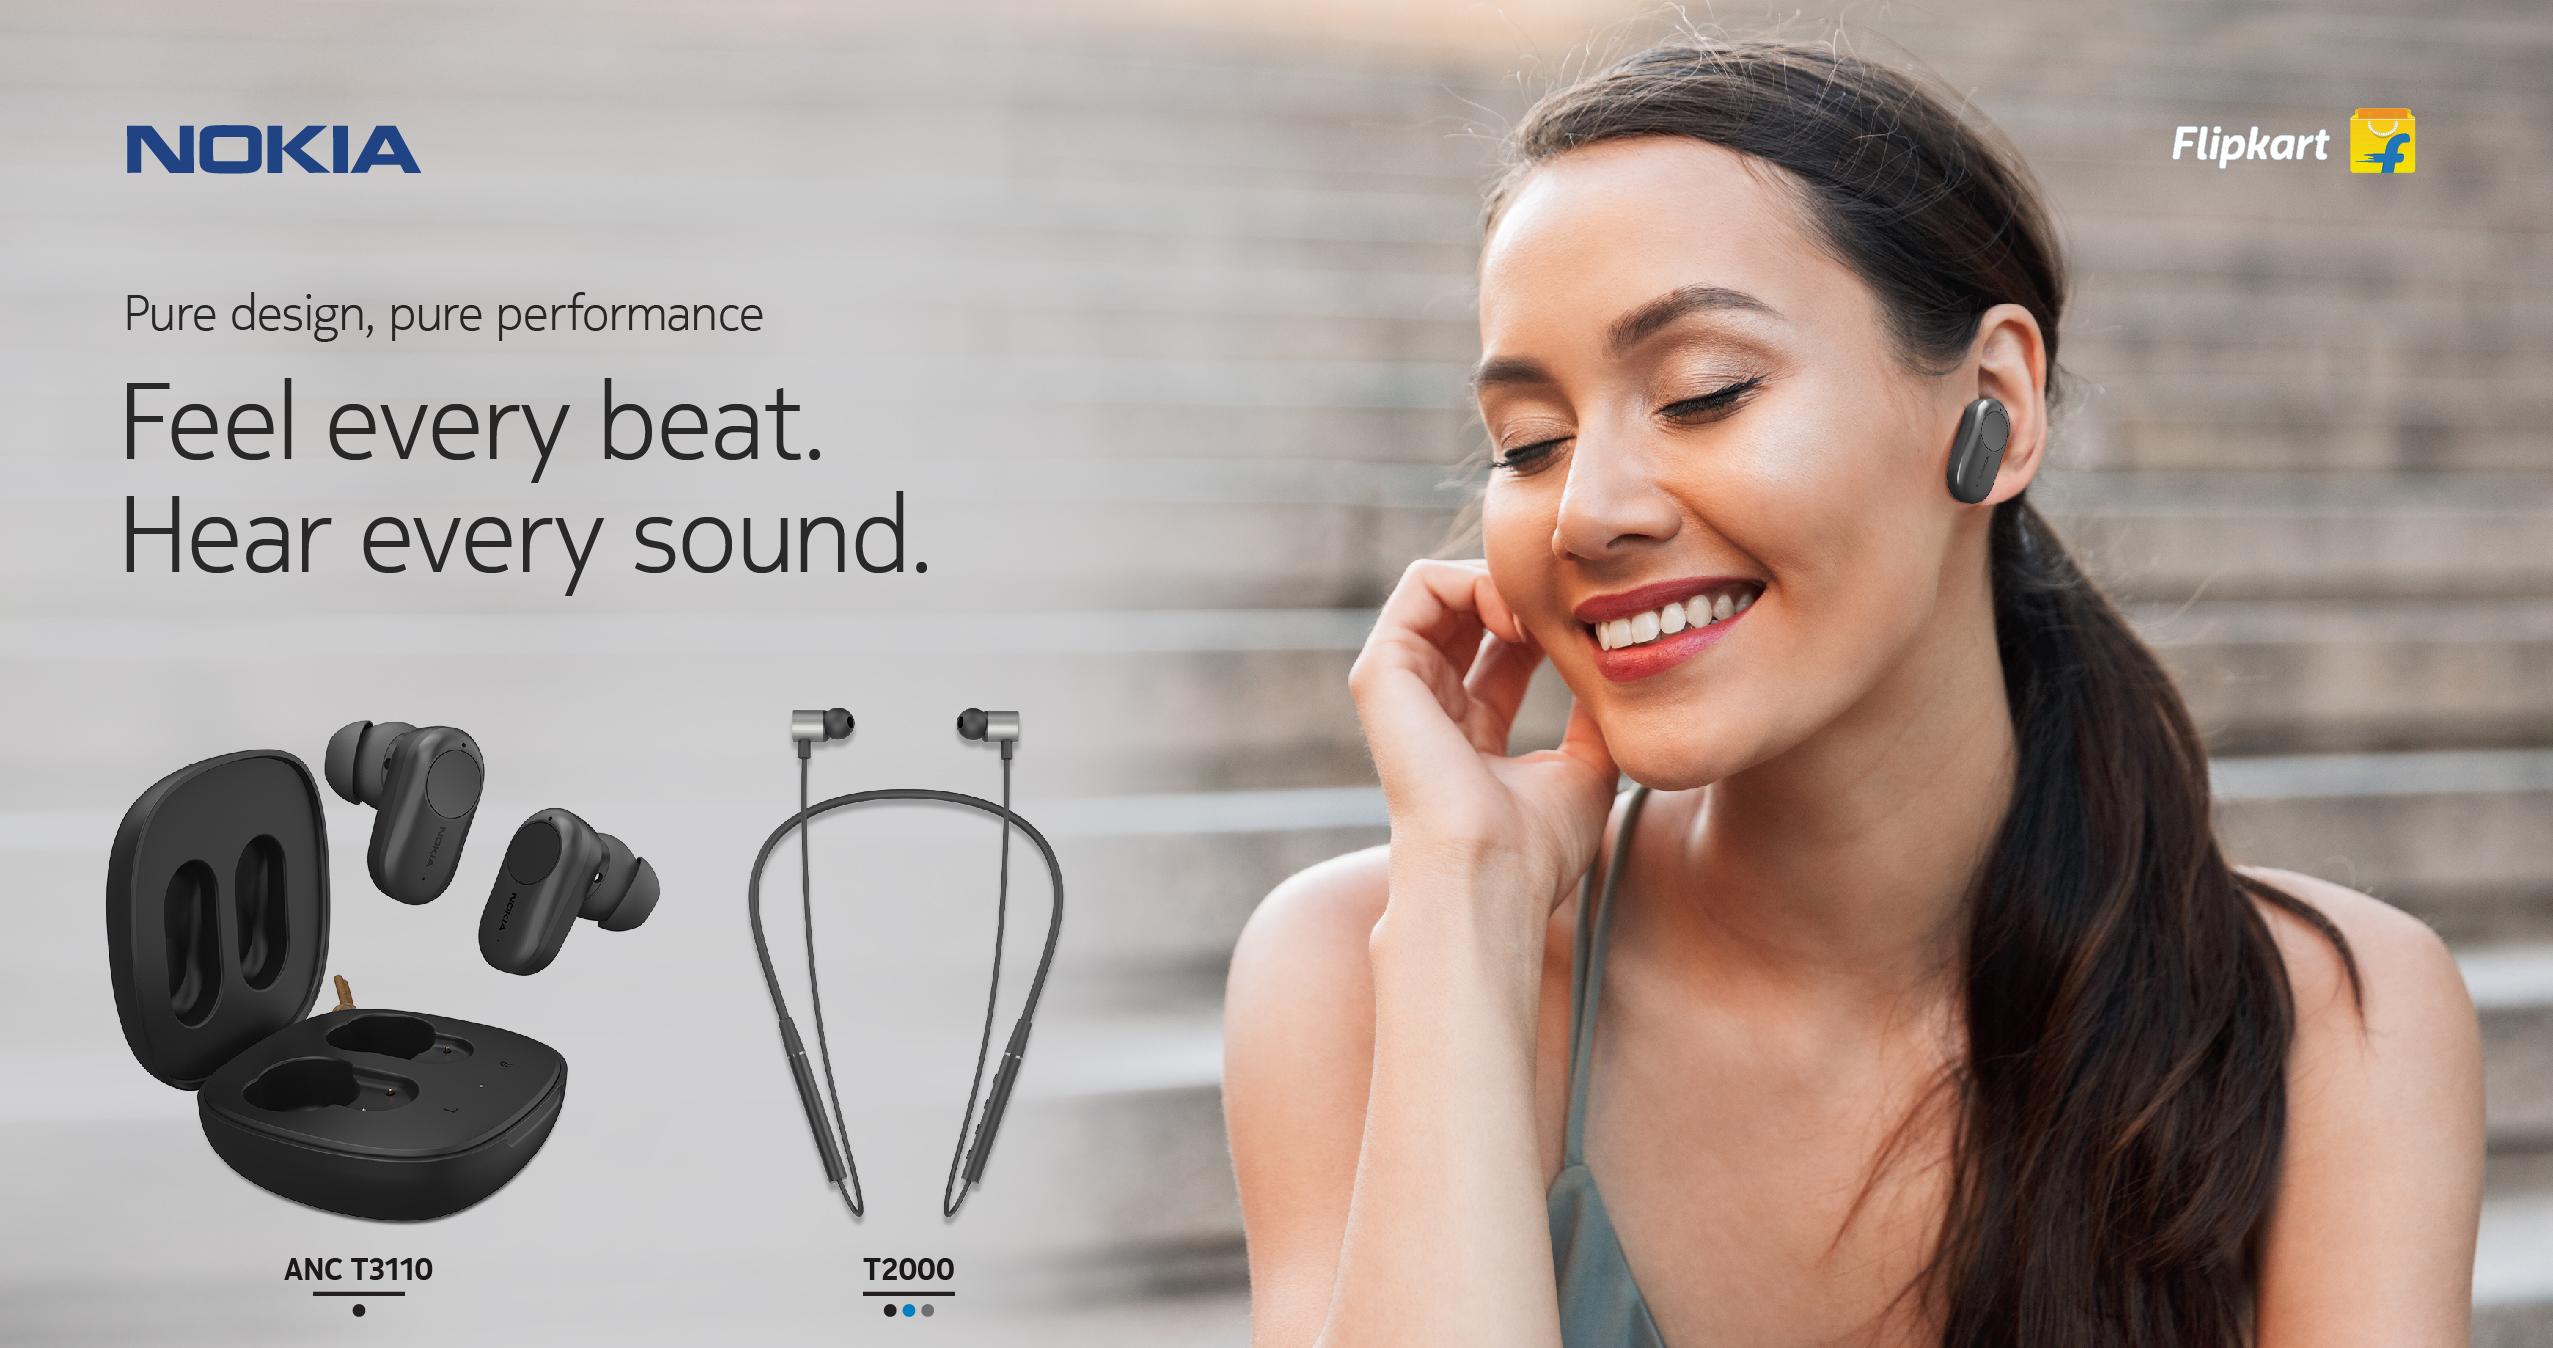 Flipkart launches Nokia TWS earbuds along with Neckband wireless earphones